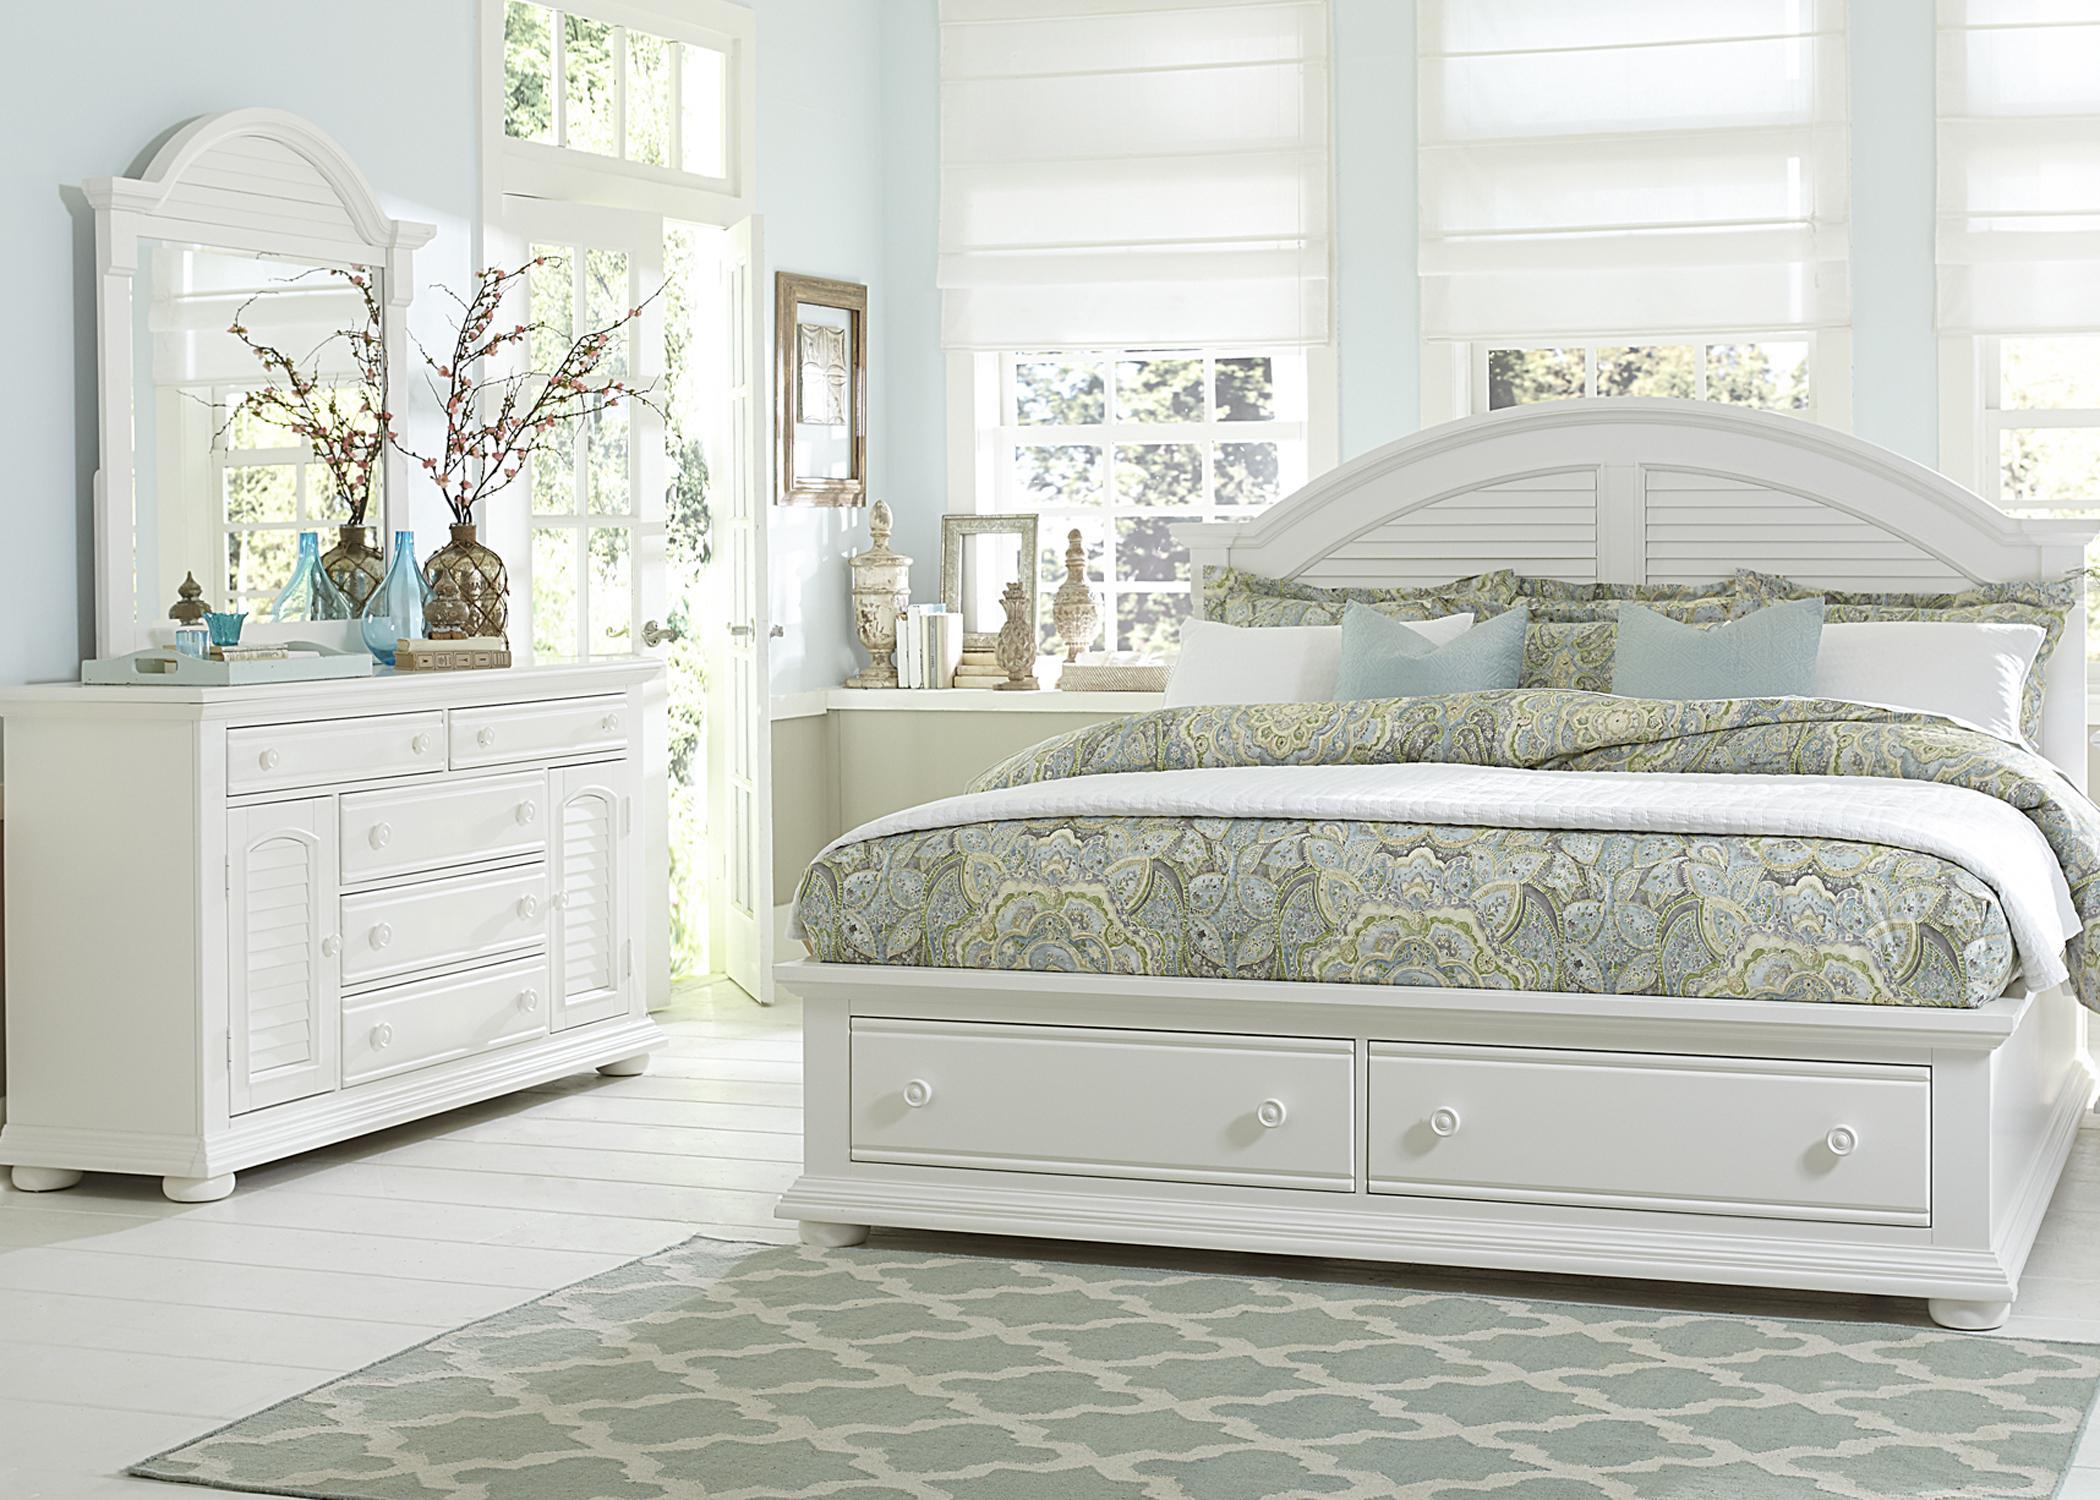 Liberty Furniture Summer House King Bedroom Group - Item Number: 607 K Bedroom Group 4